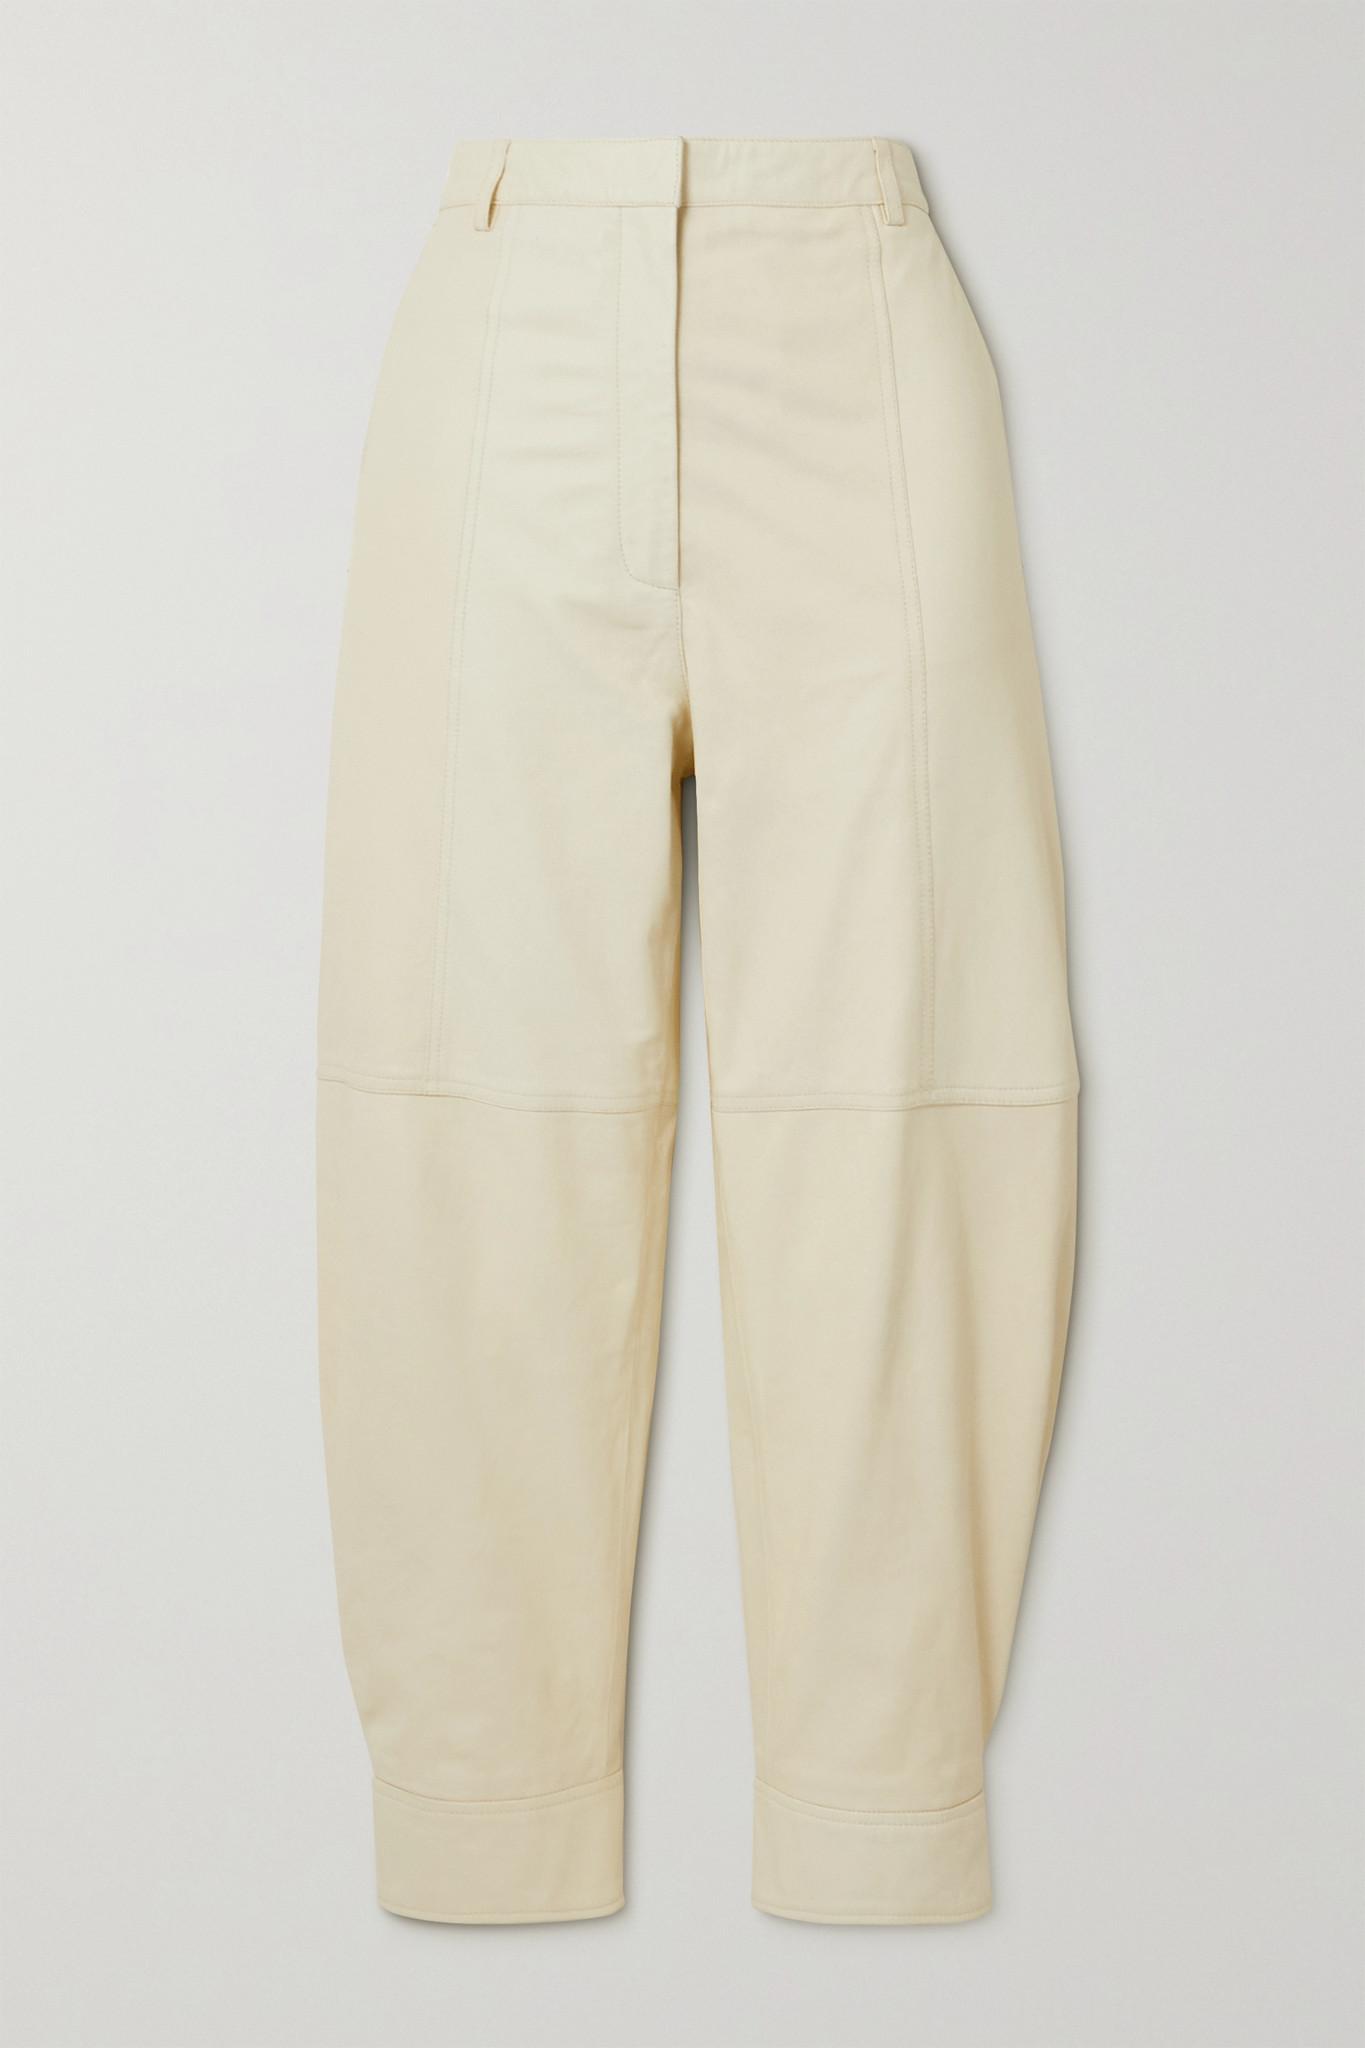 TIBI - Leather Tapered Pants - Cream - US2